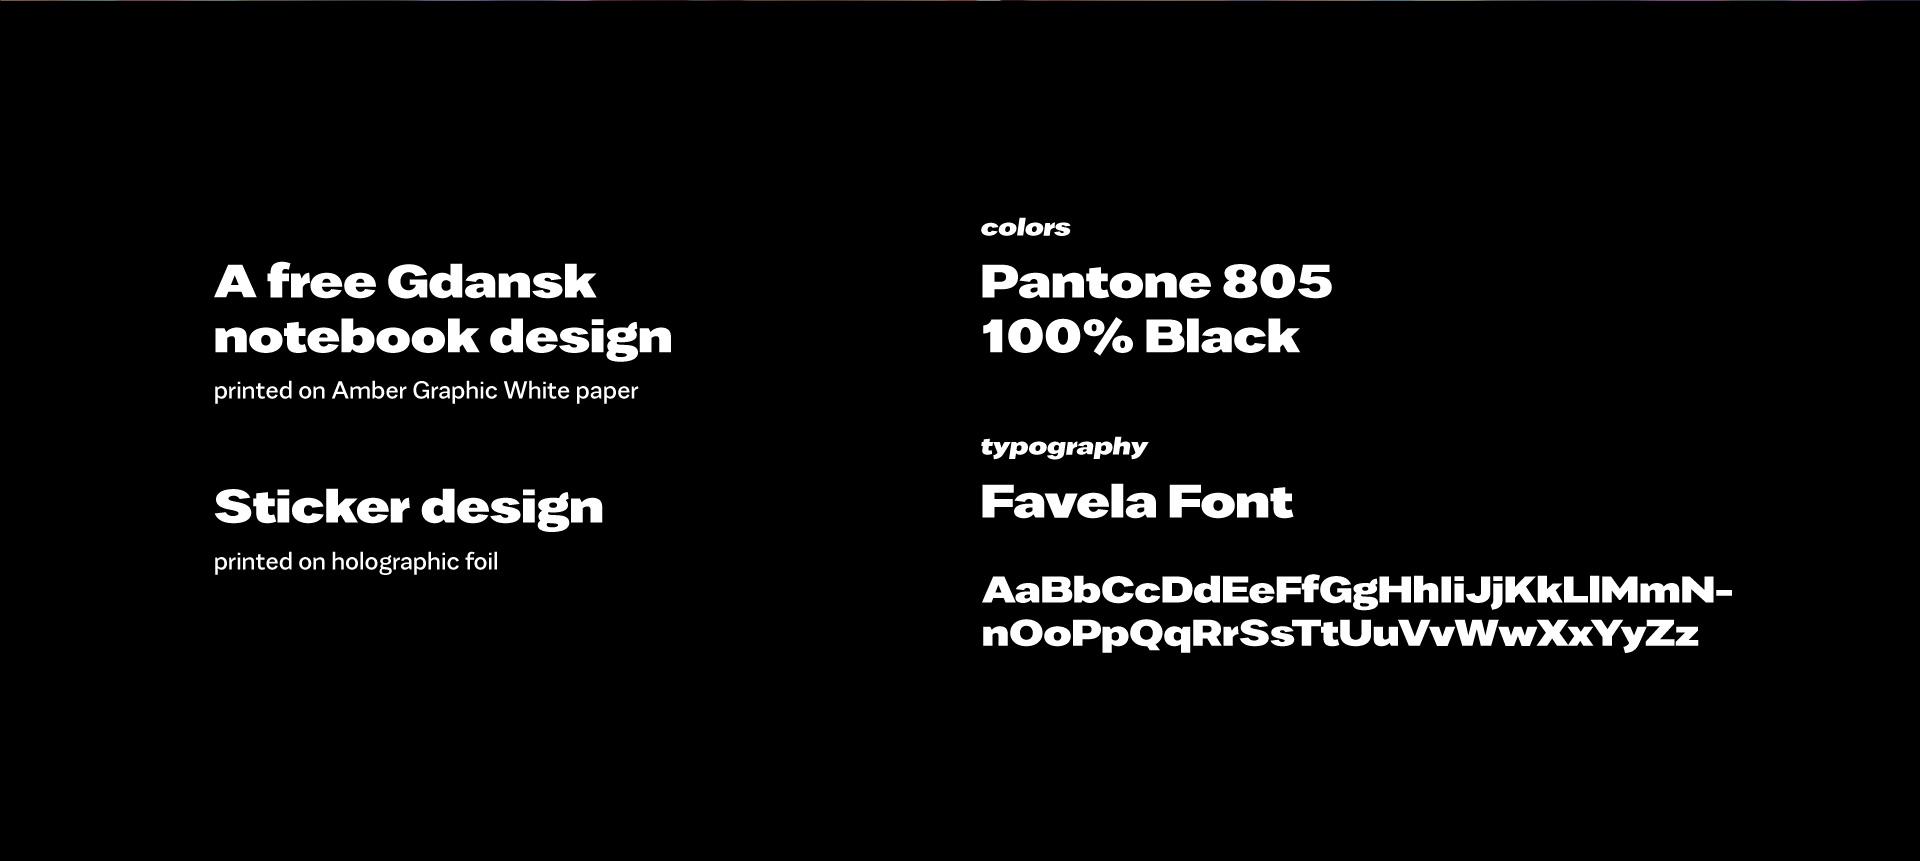 projekt graficzny typografia font favela modern